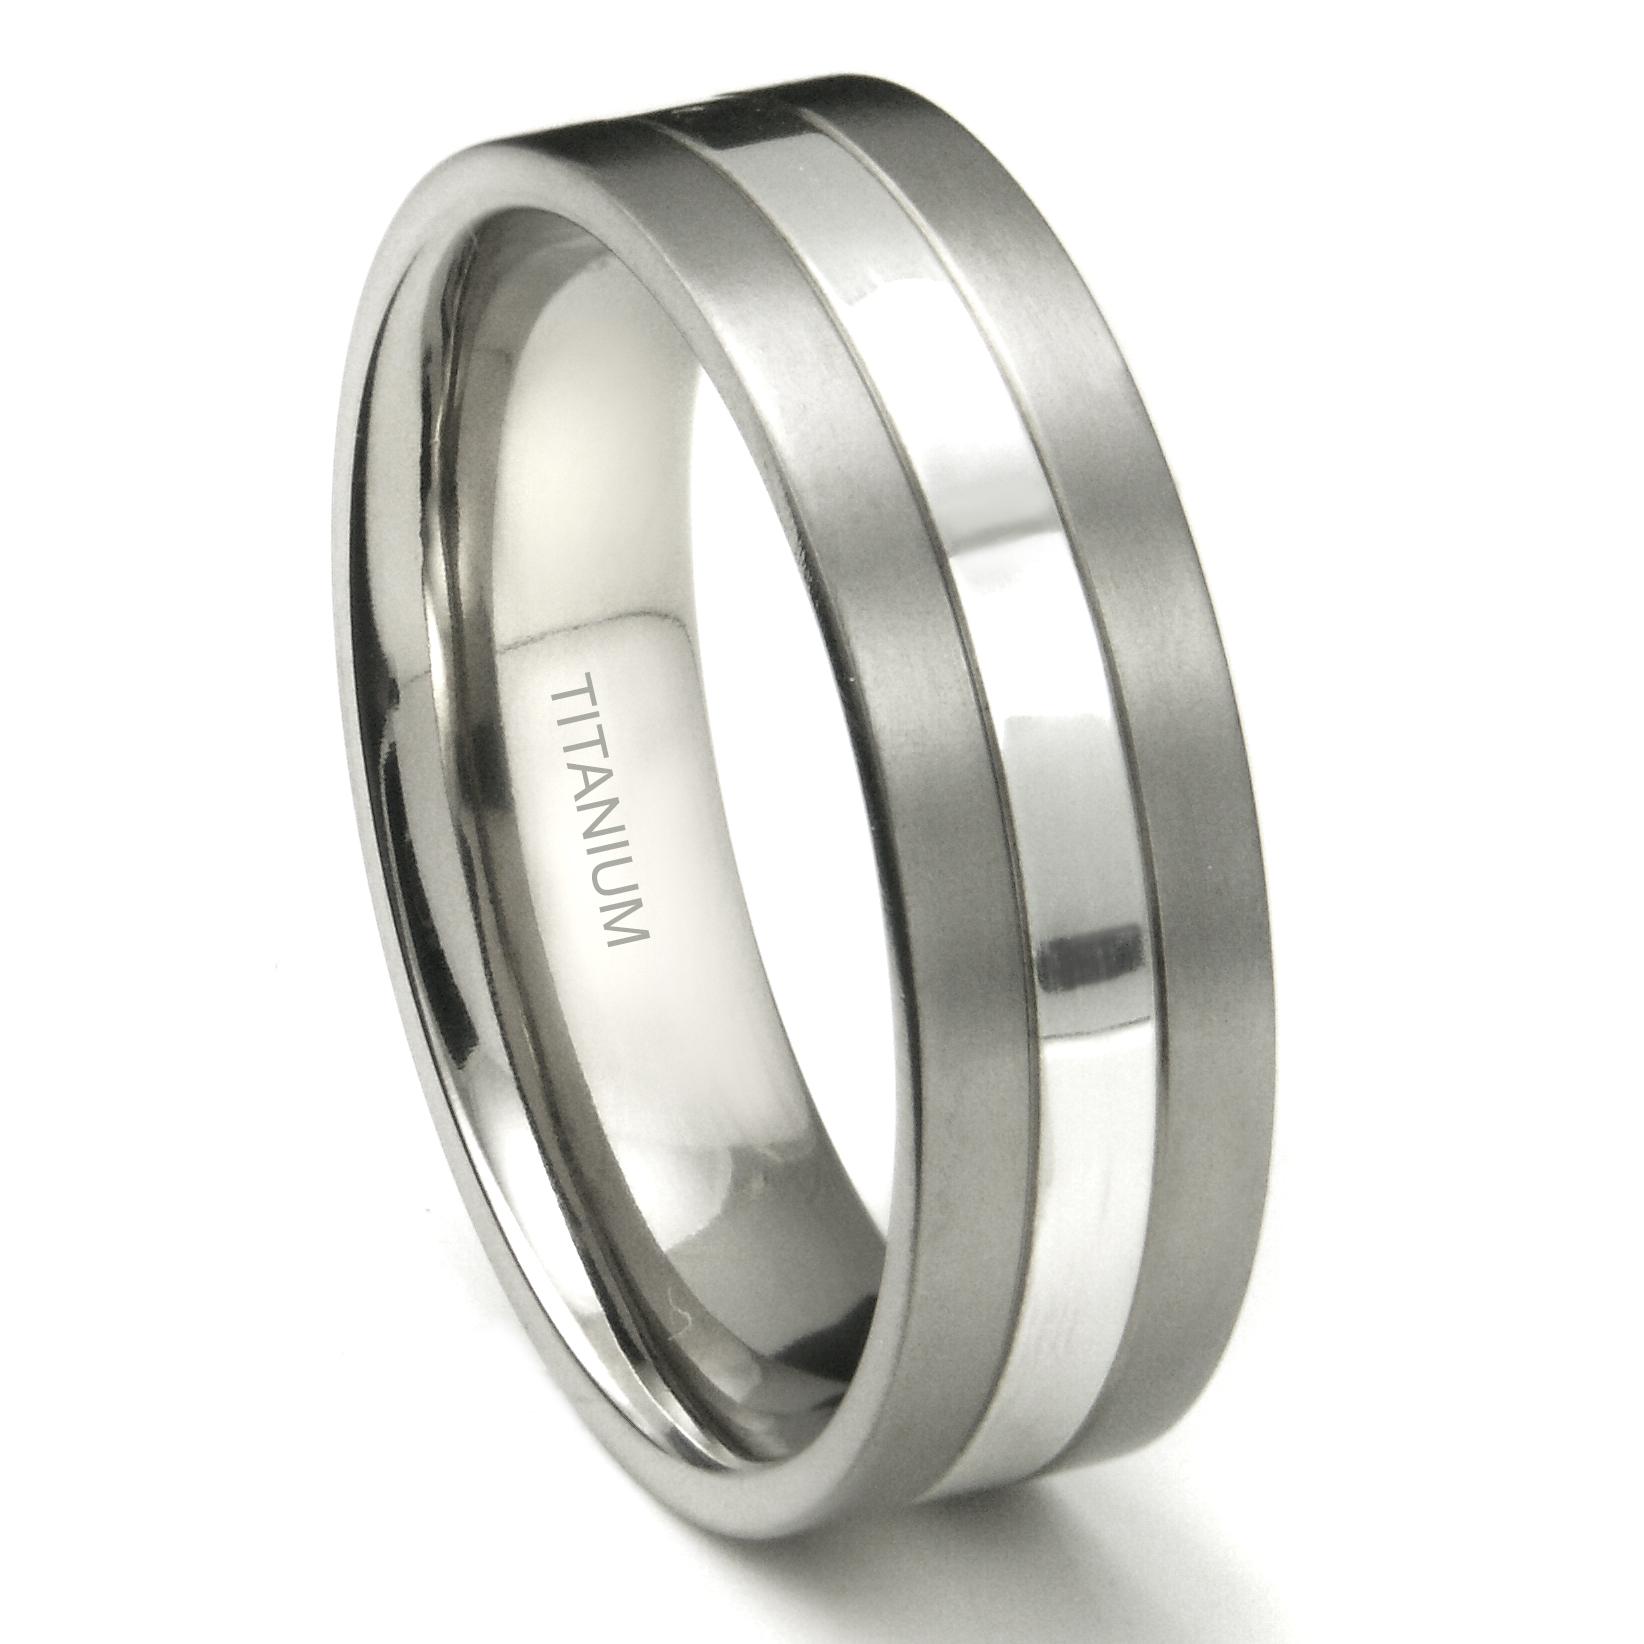 Titanium 7mm Two Tone Wedding Ring P mens wedding rings titanium Home Men s Titanium Wedding Rings Loading zoom